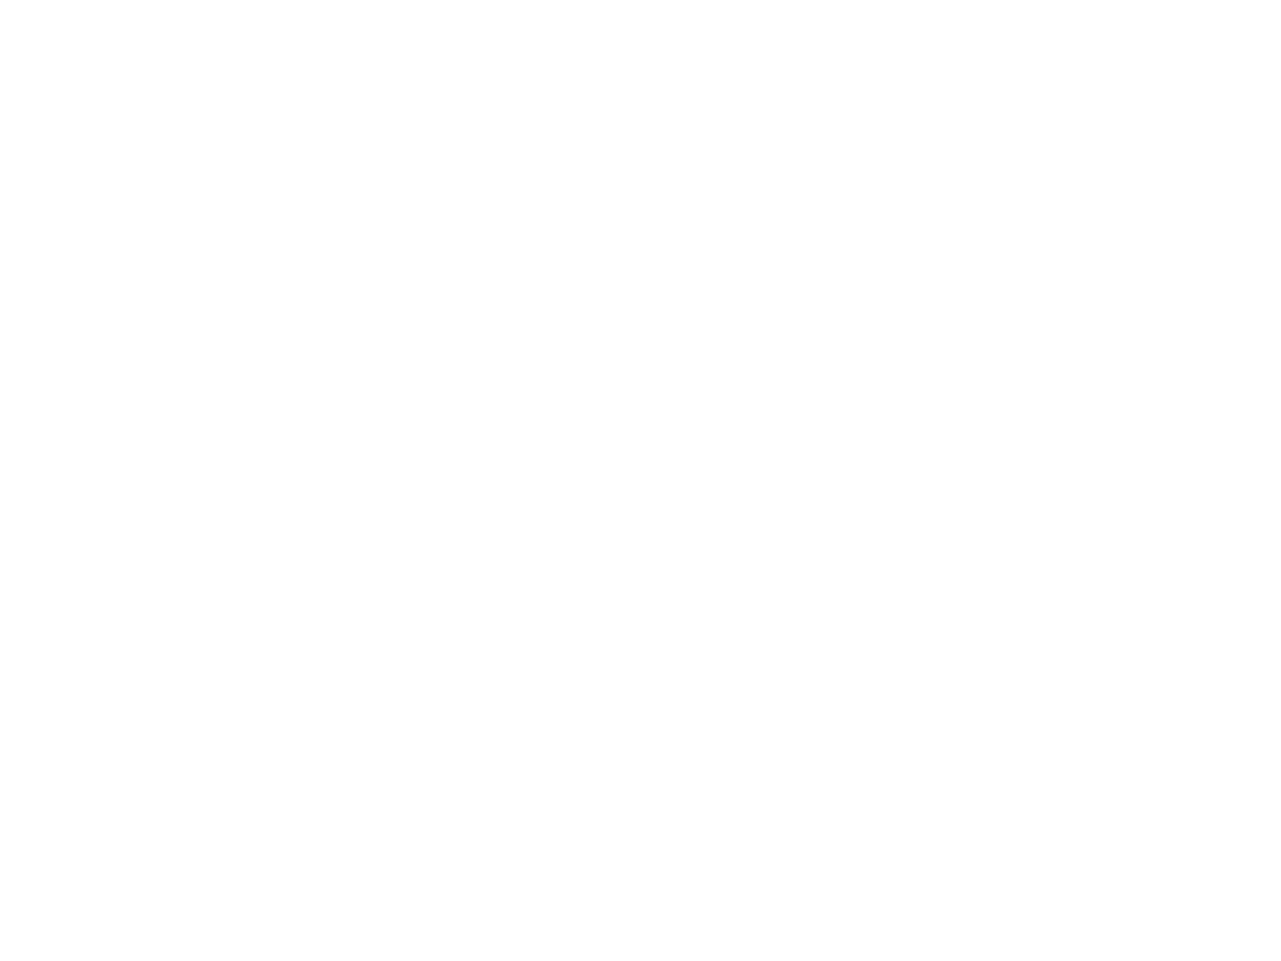 Decumano, Expo Milano 2015